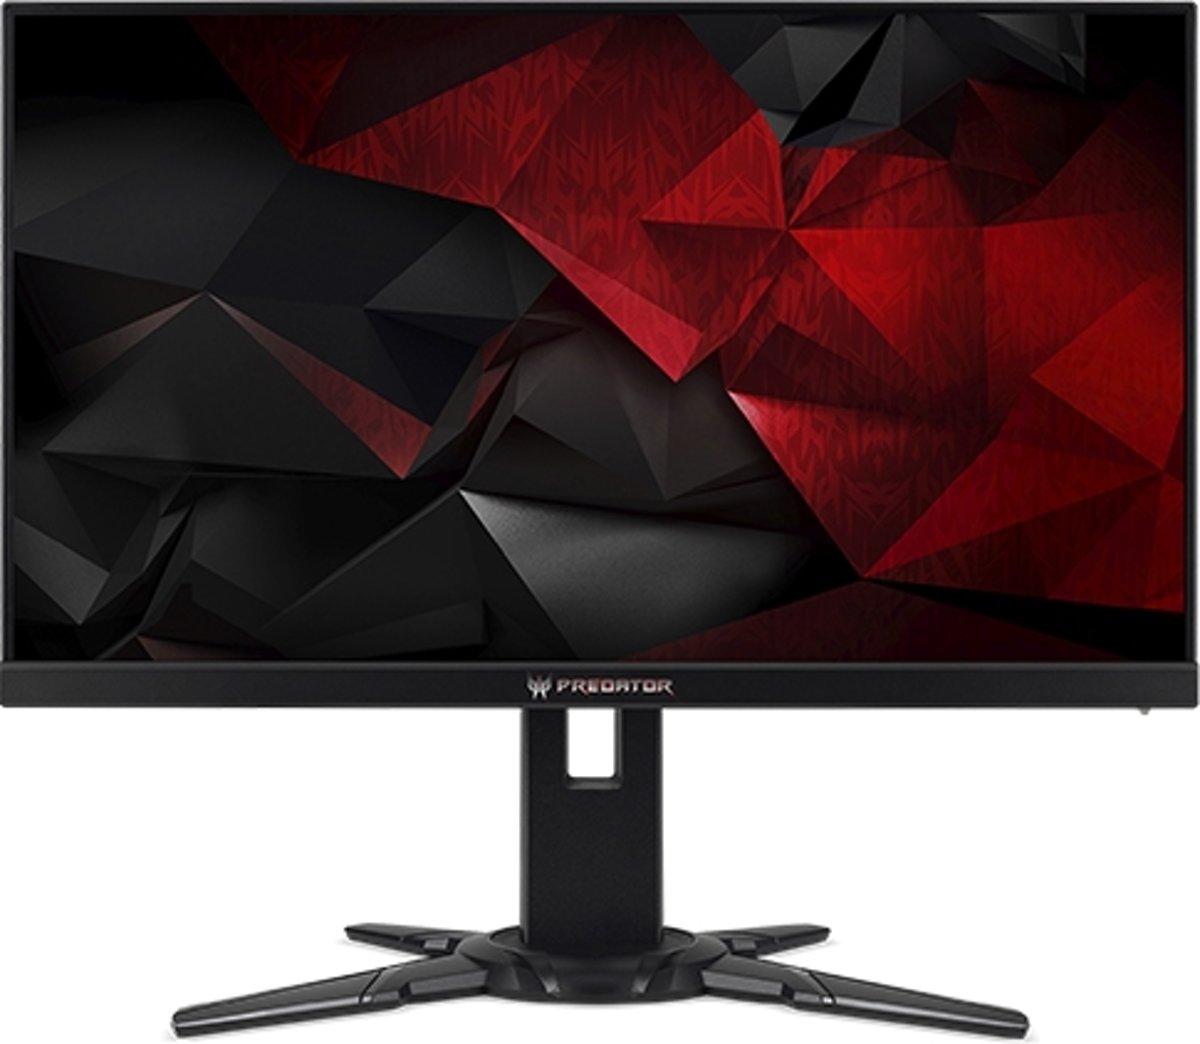 Acer Predator XB272bmiprz - Gaming Monitor